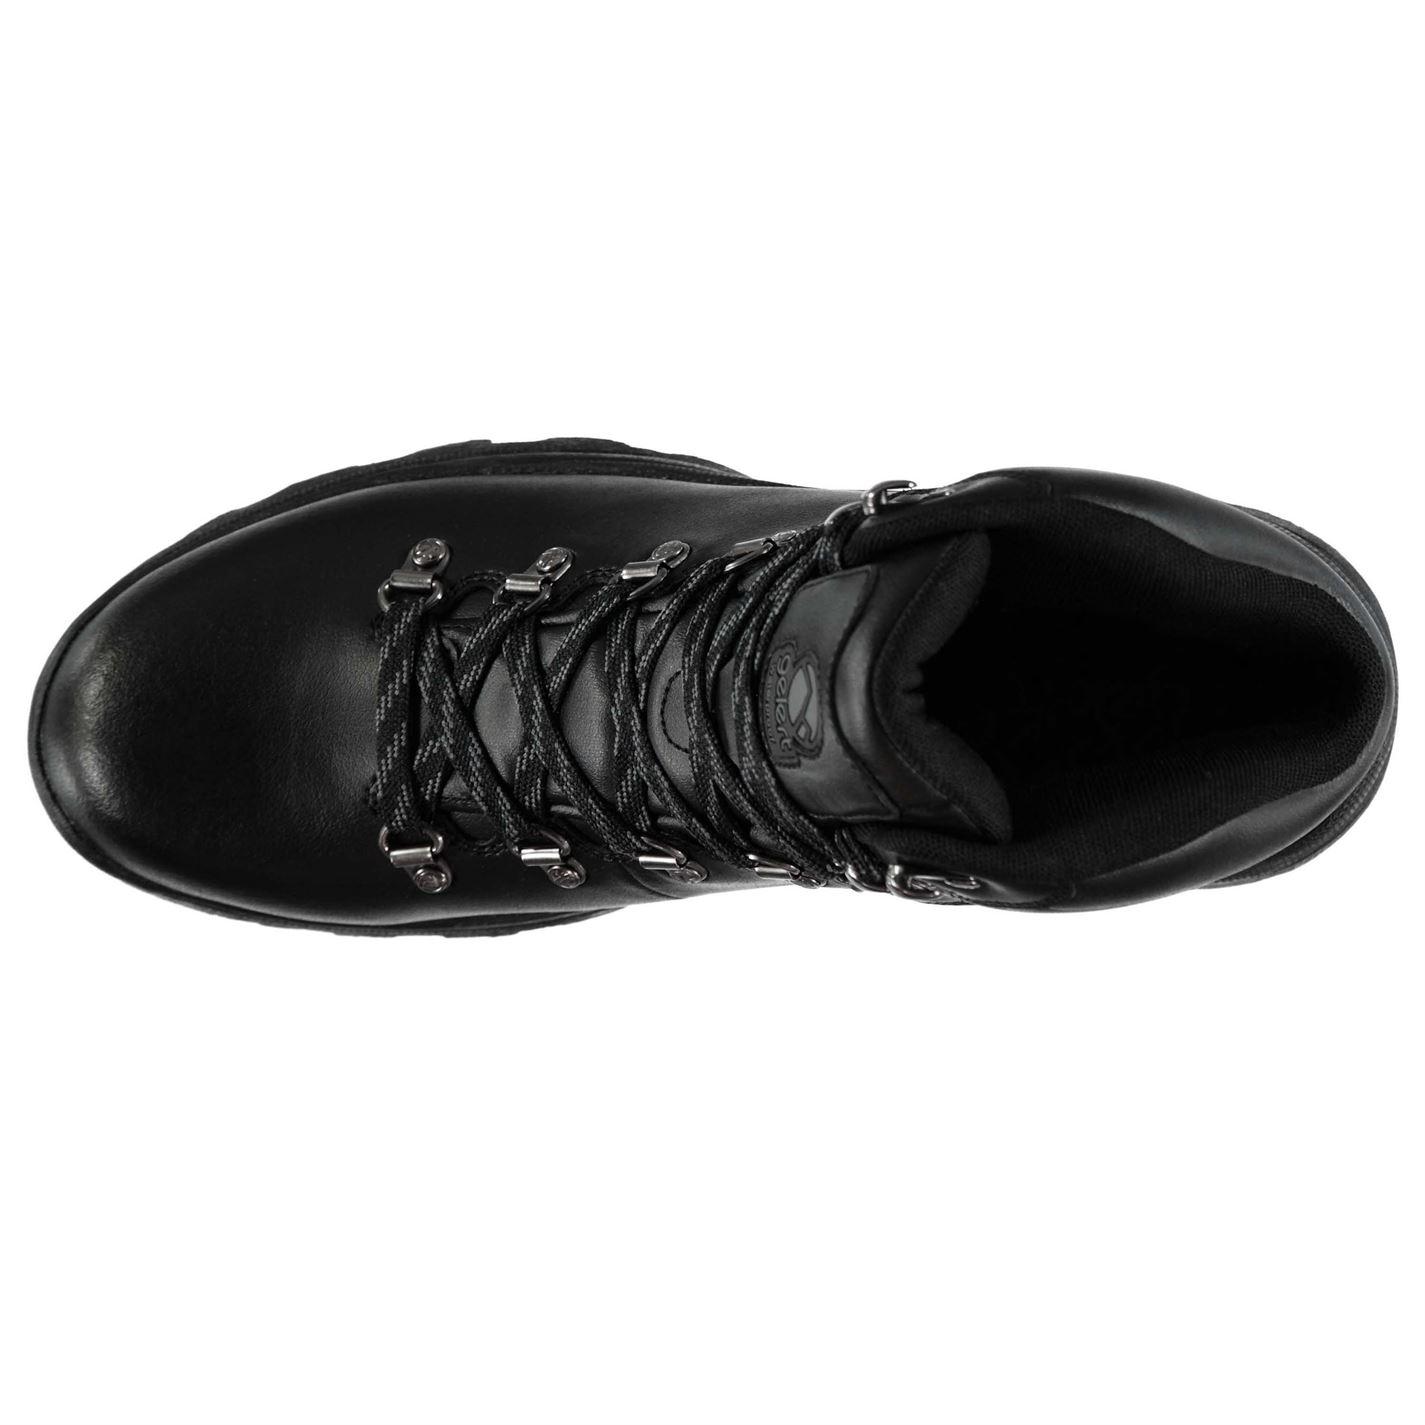 Gelert Atlantis Walking Boots Mens Gents Shoes Laces Fastened Water Repellent